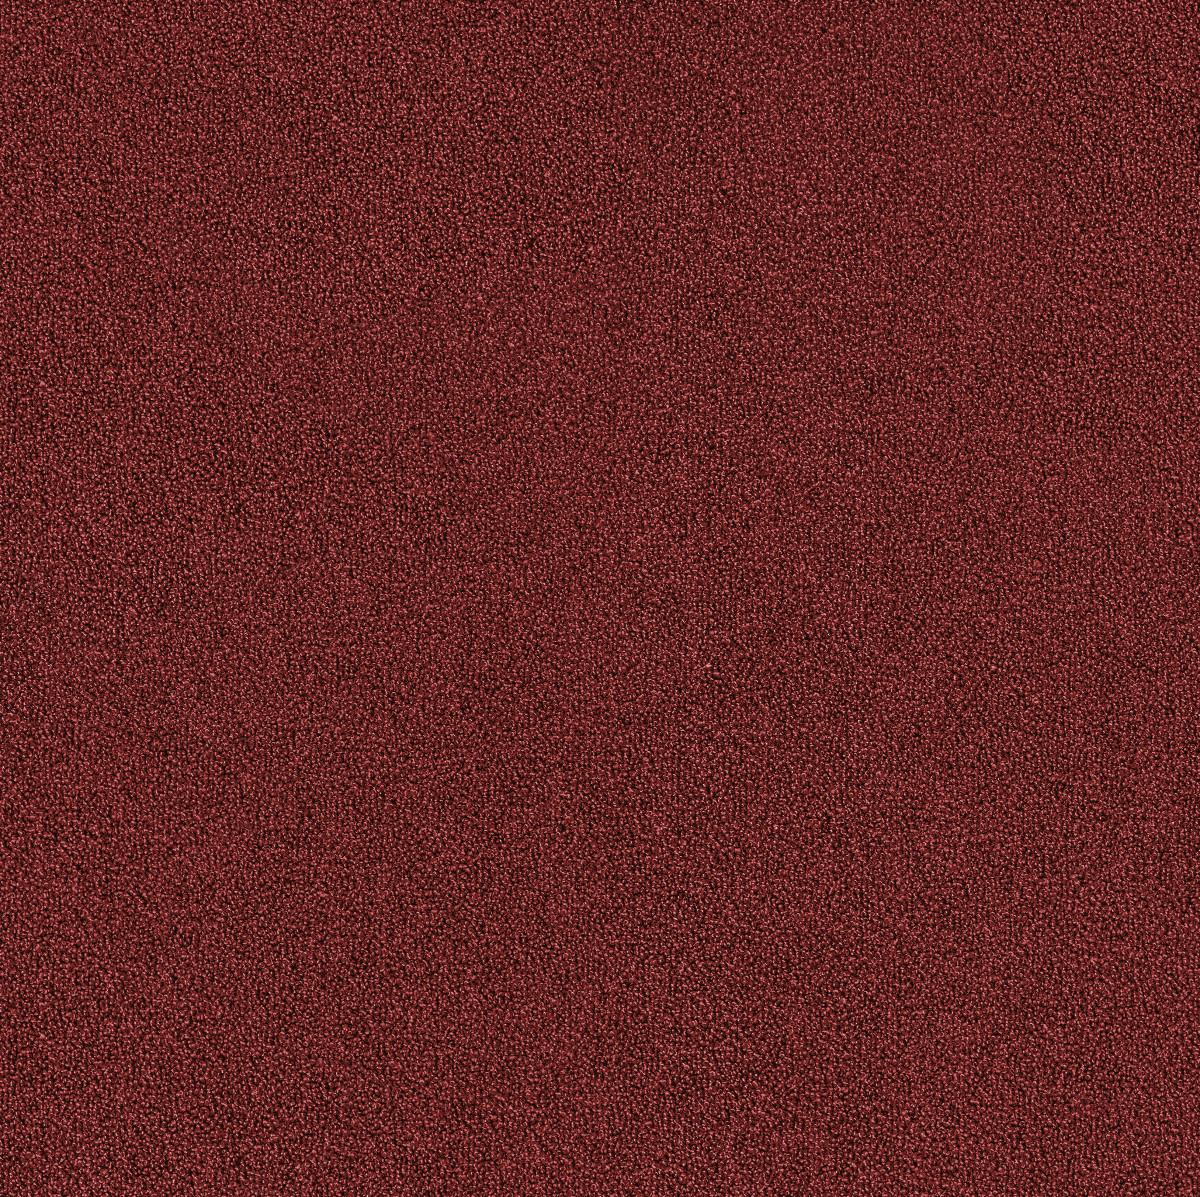 teppichboden ambra 400cm trend 20 farbe 11. Black Bedroom Furniture Sets. Home Design Ideas